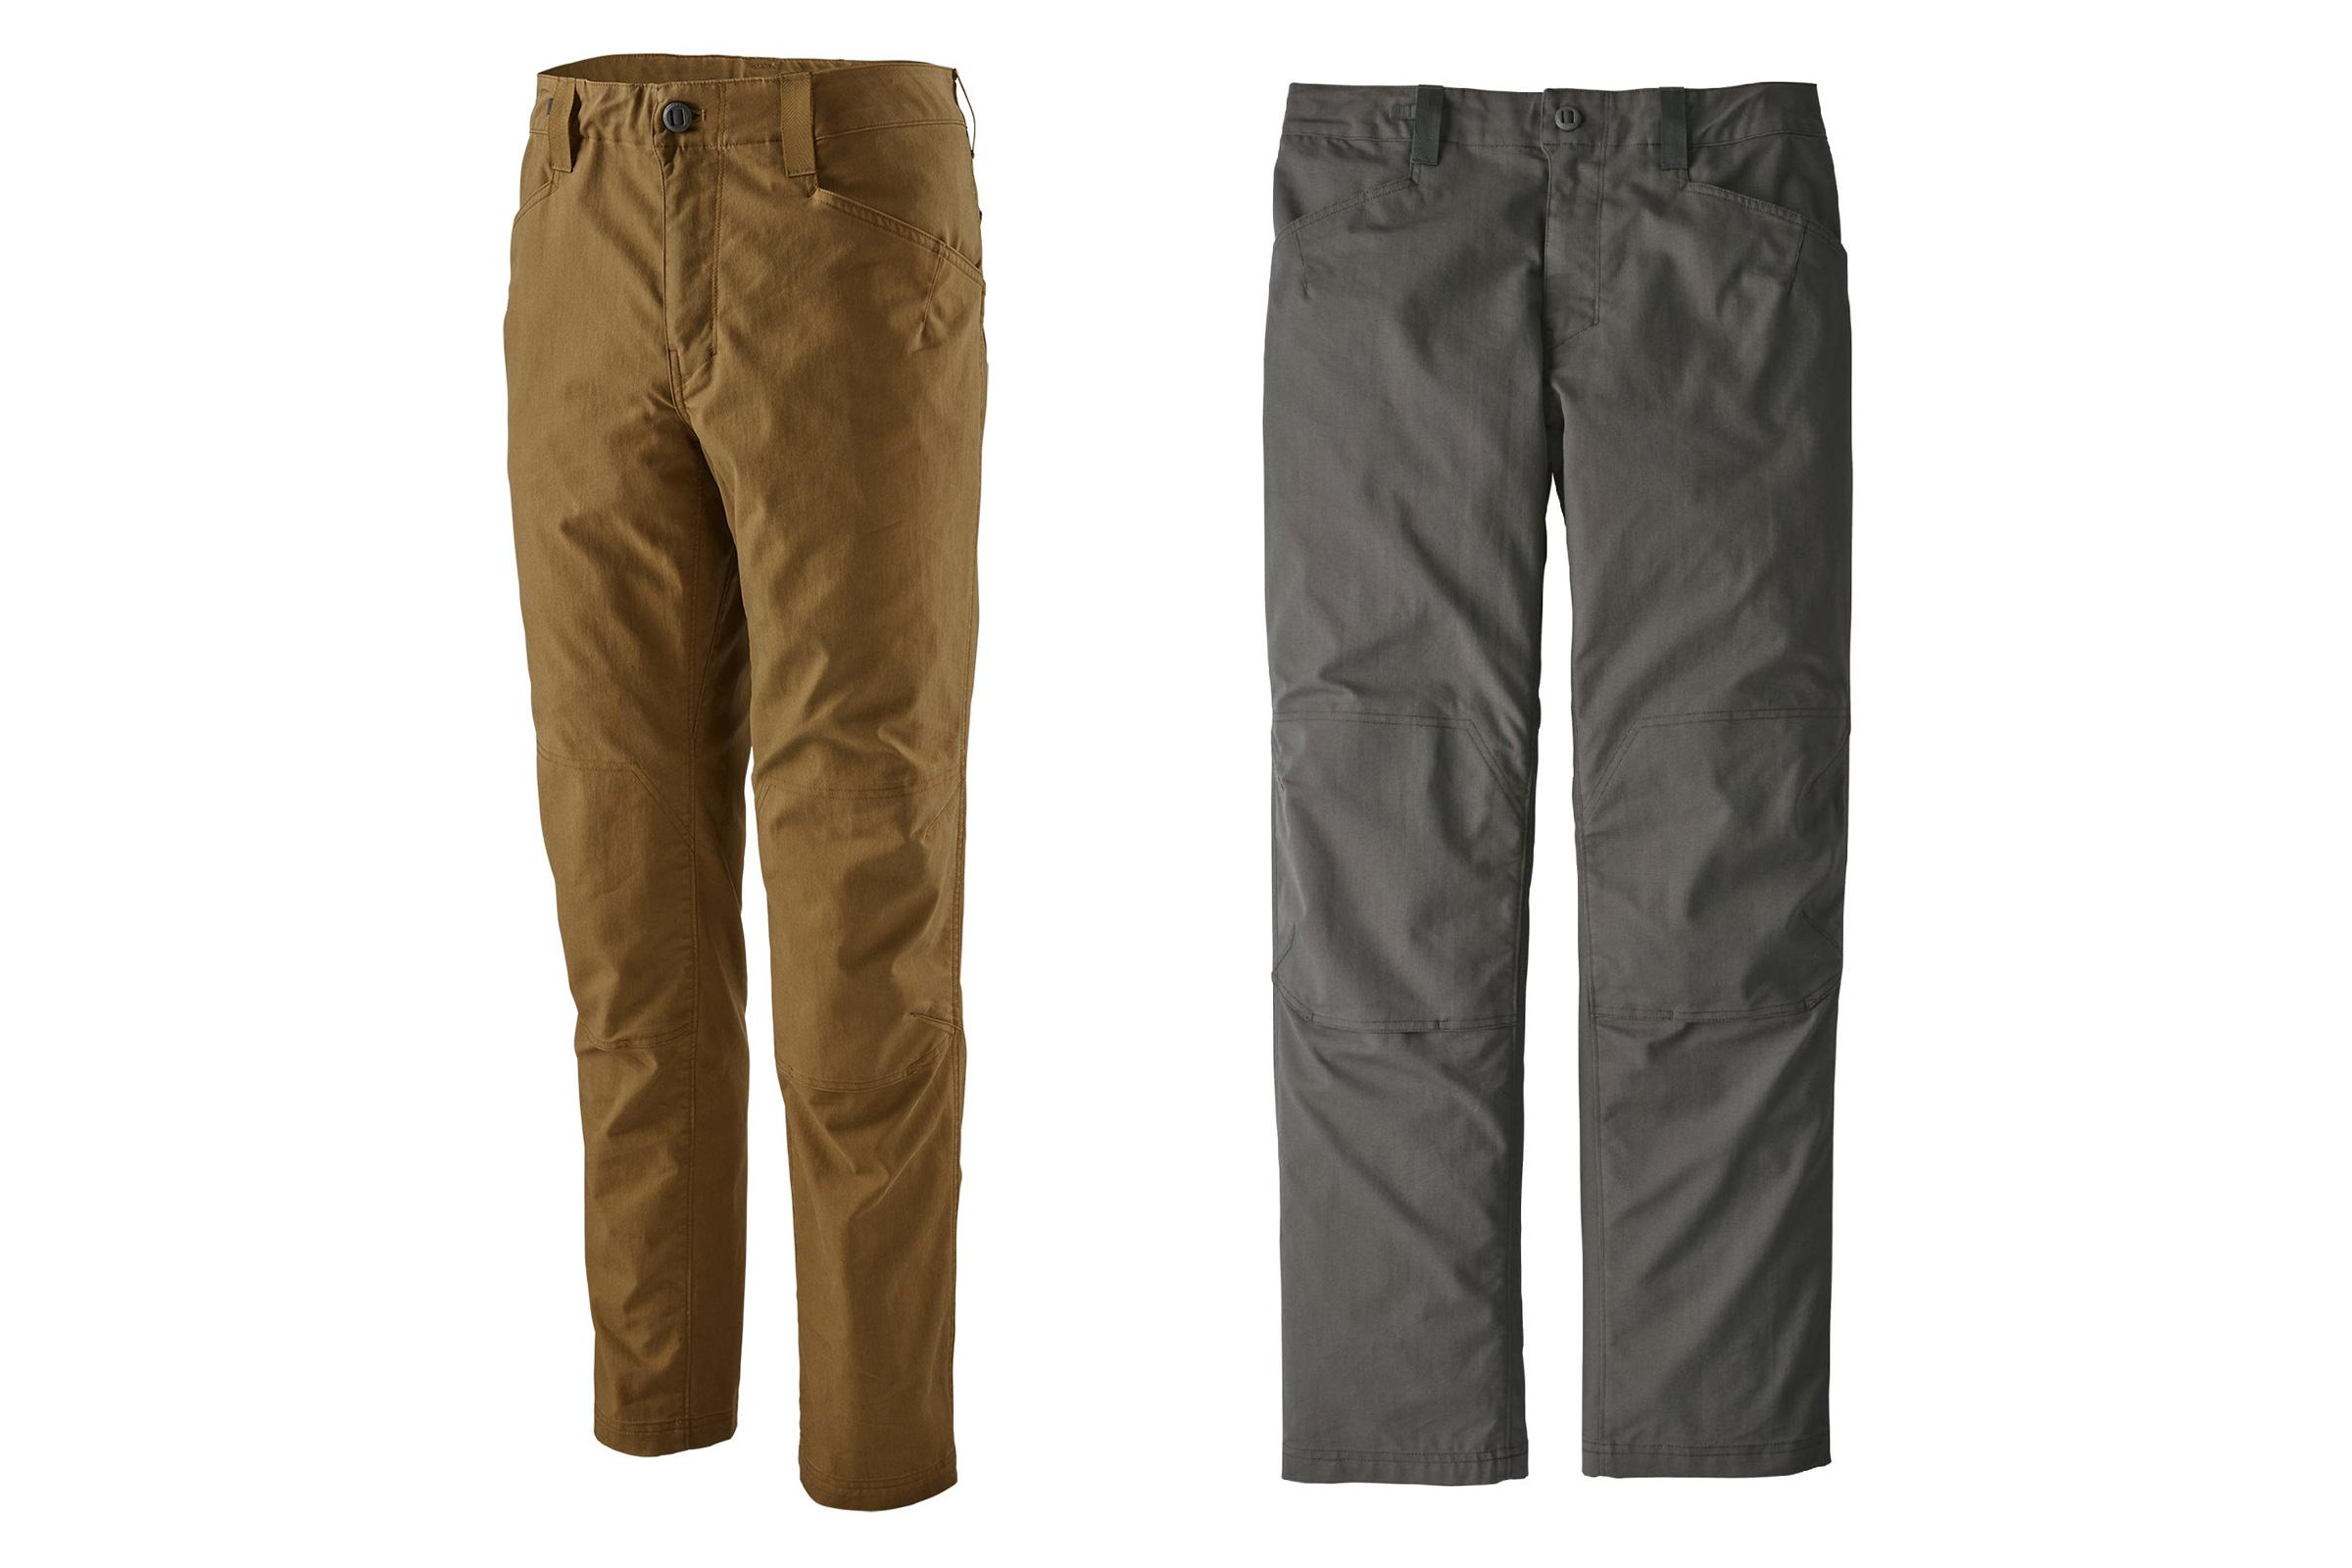 Patagonia Gritstone Pants